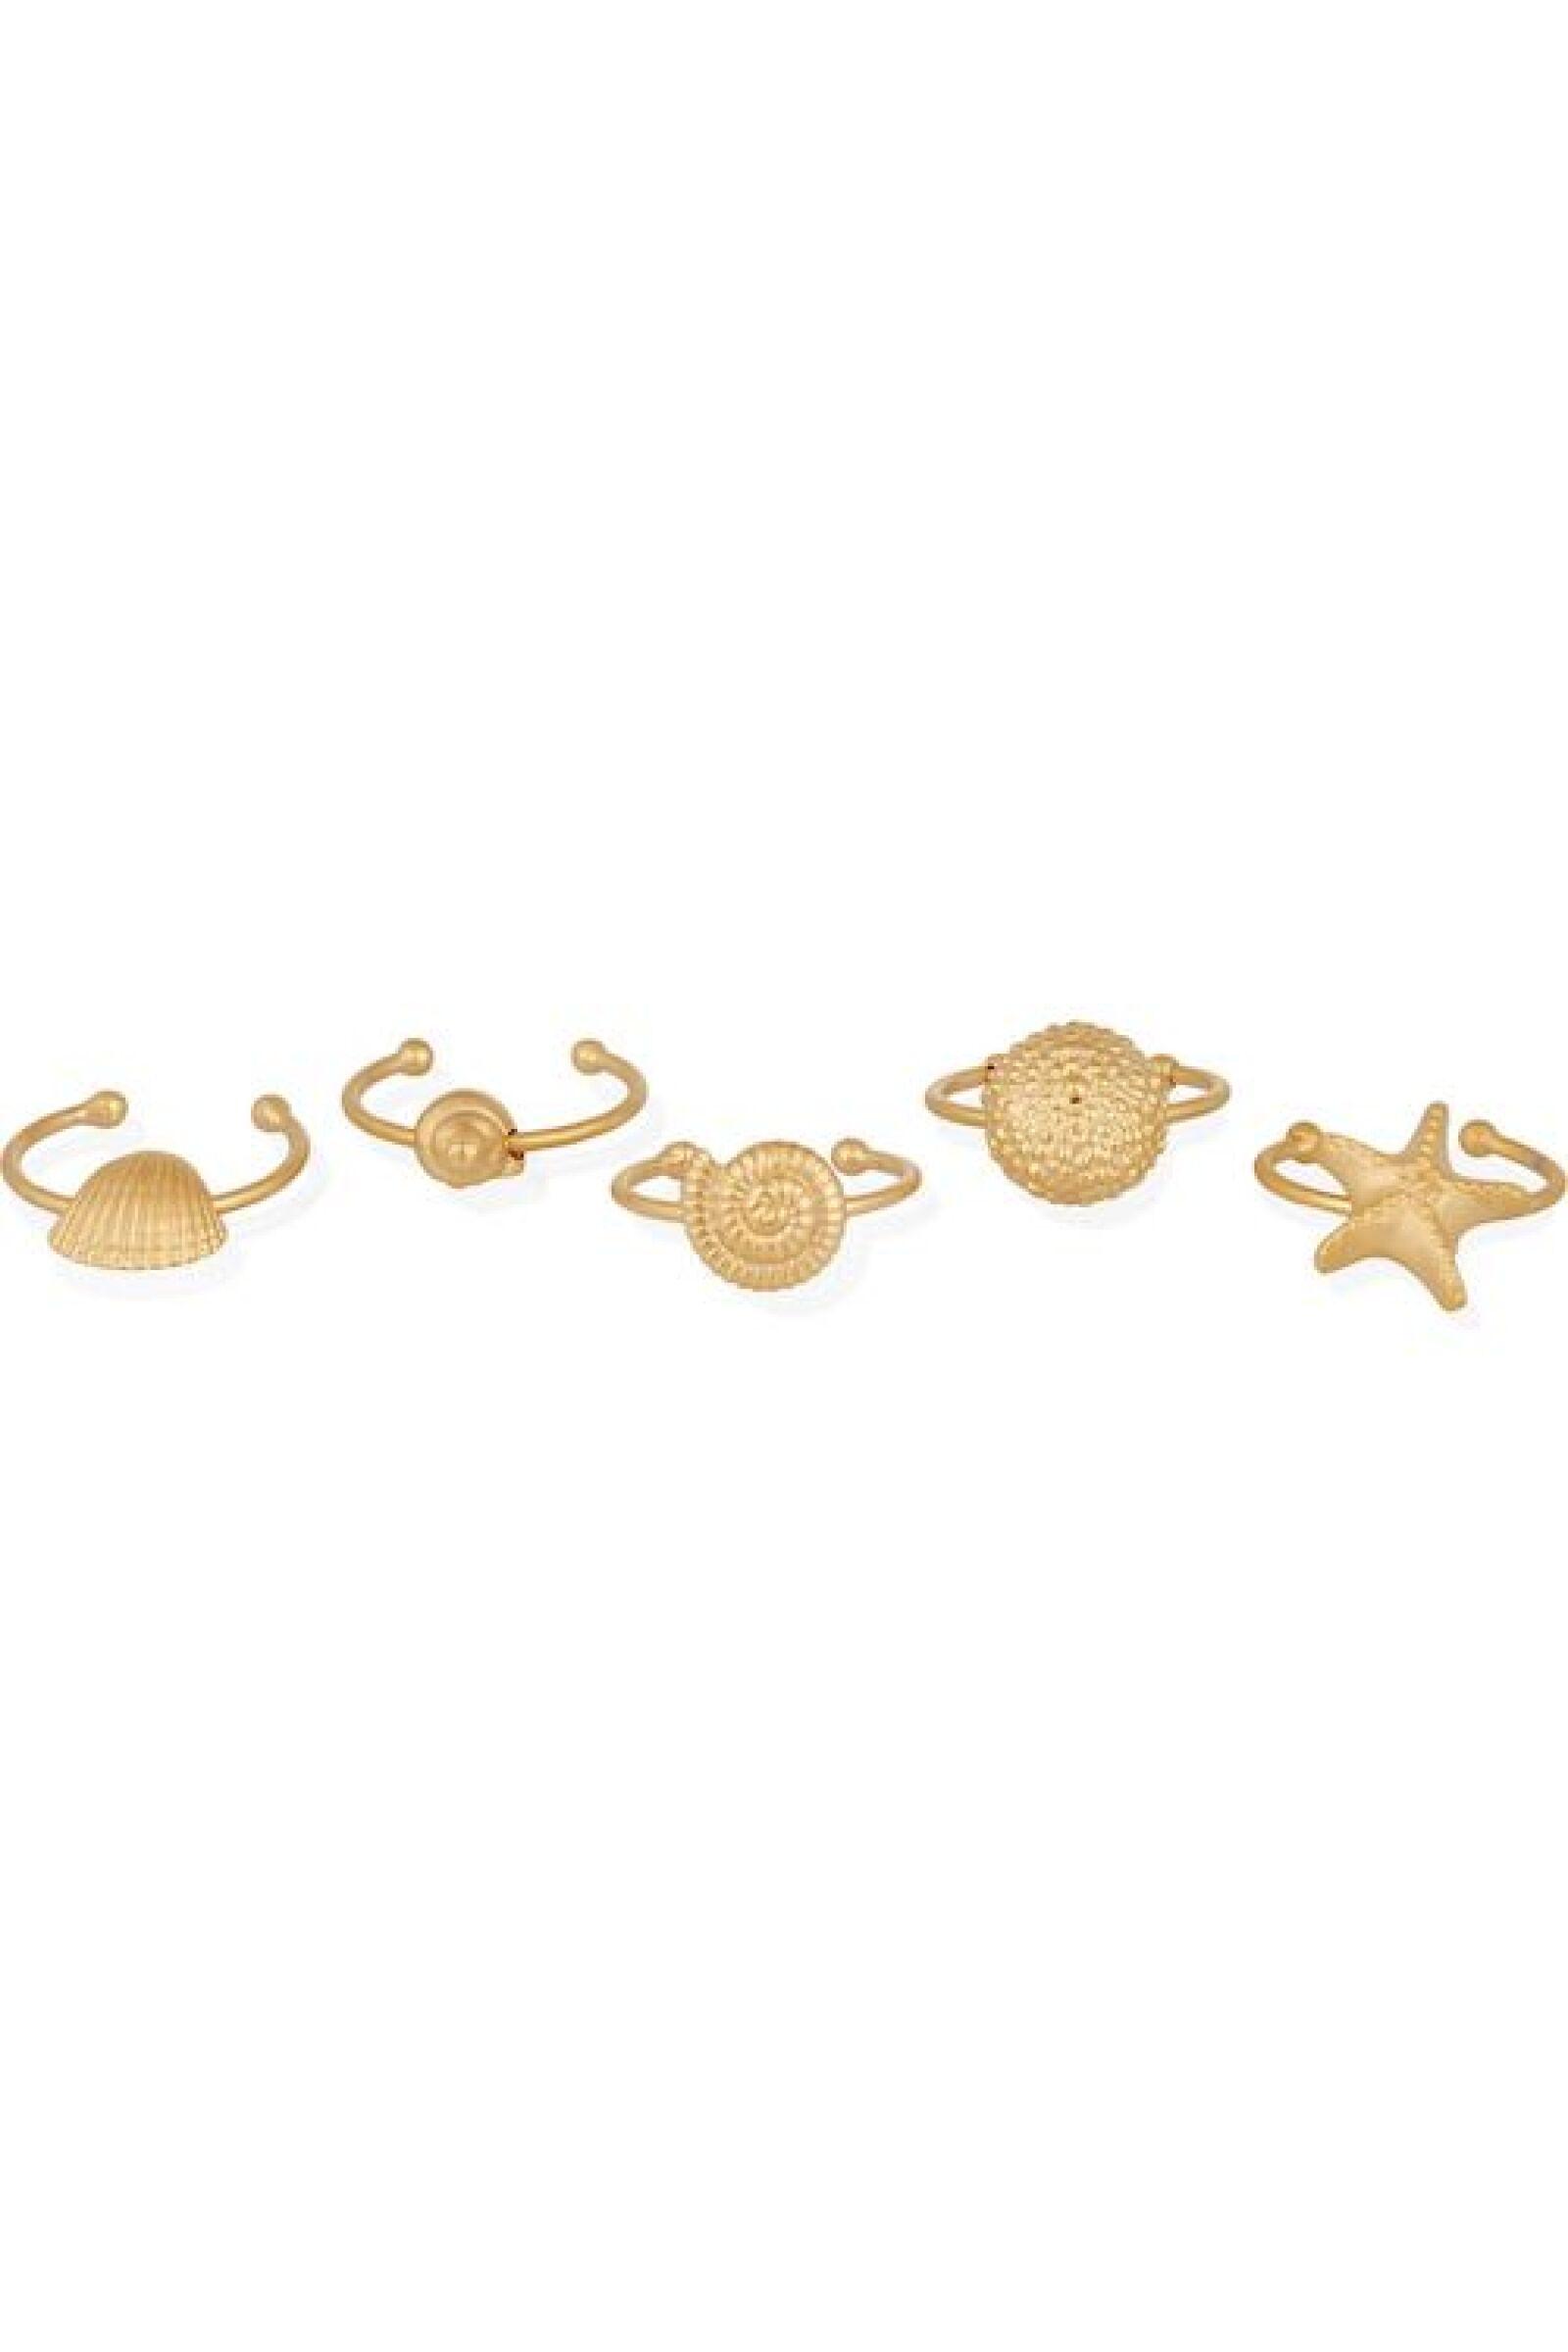 Valentino Rings